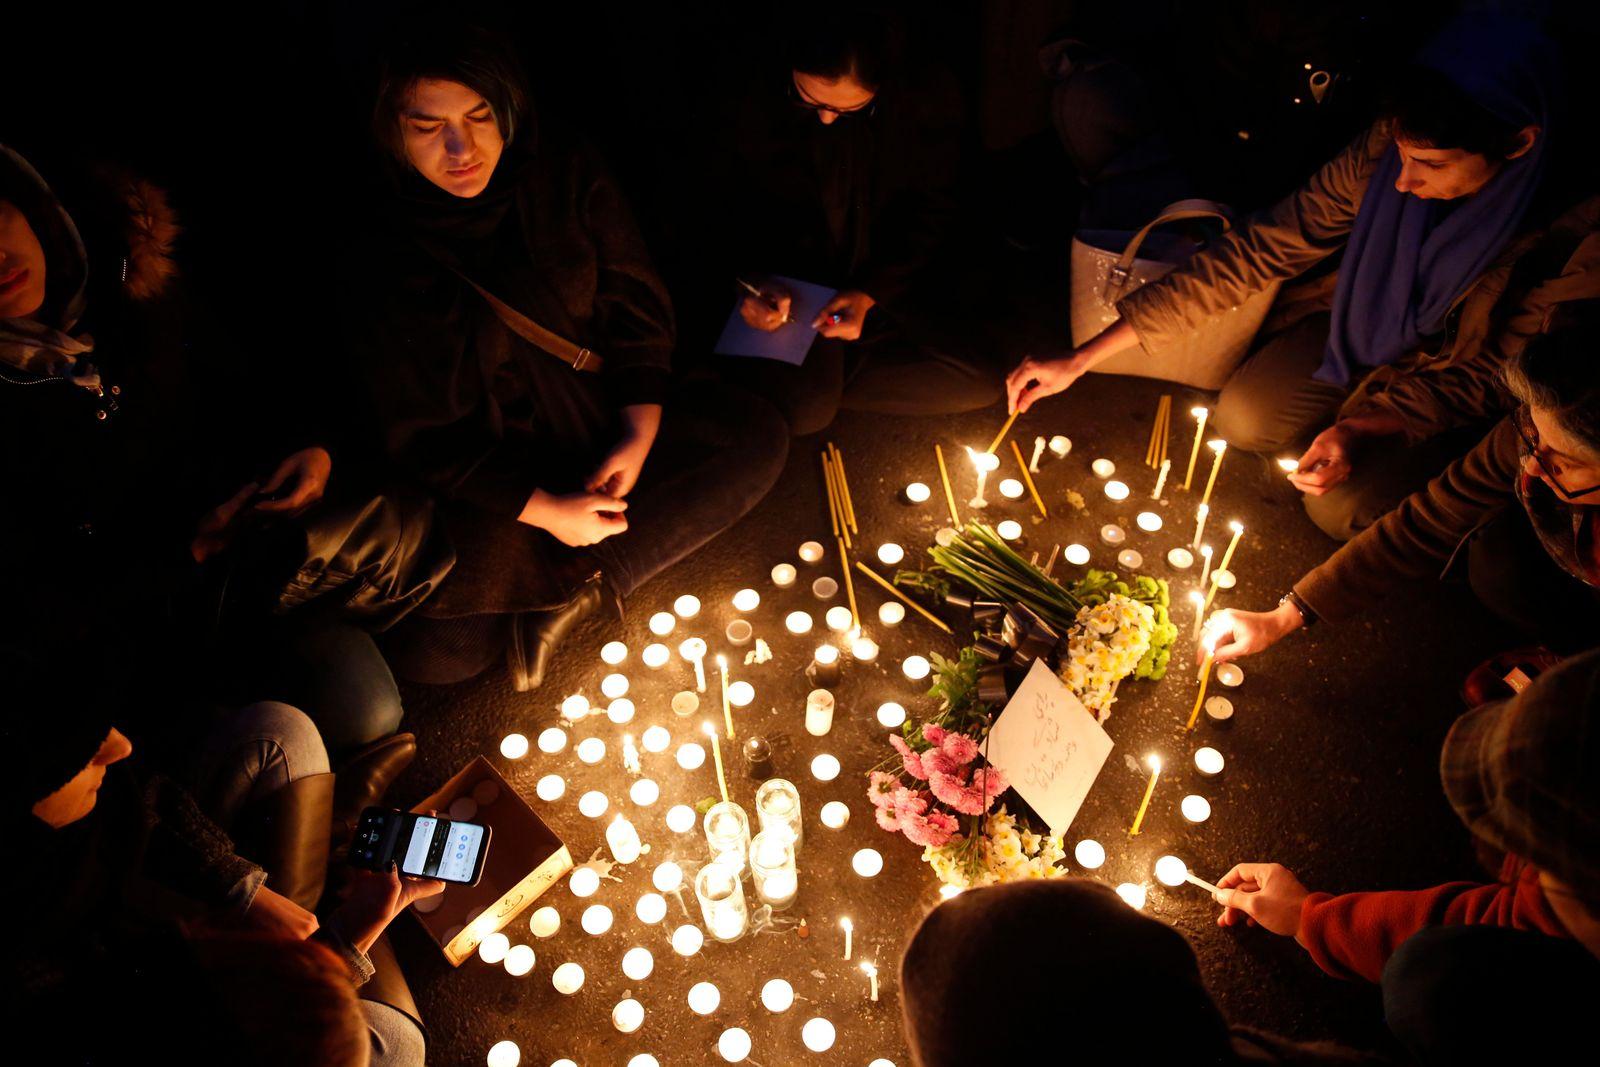 Protets over Iran admits shooting down Ukraine International Airlines plane,, Tehran, Iran Islamic Republic Of - 11 Jan 2020